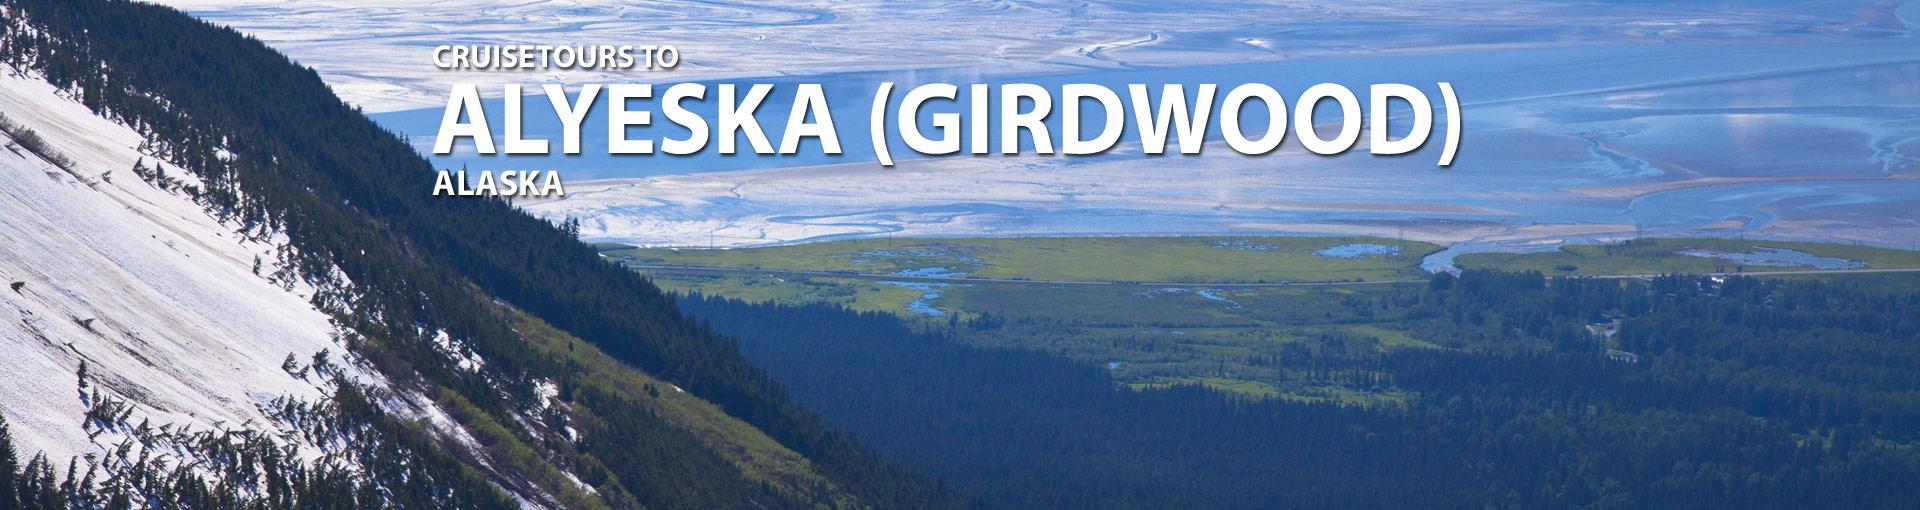 Cruisetours to Alyeska (Girdwood), Alaska